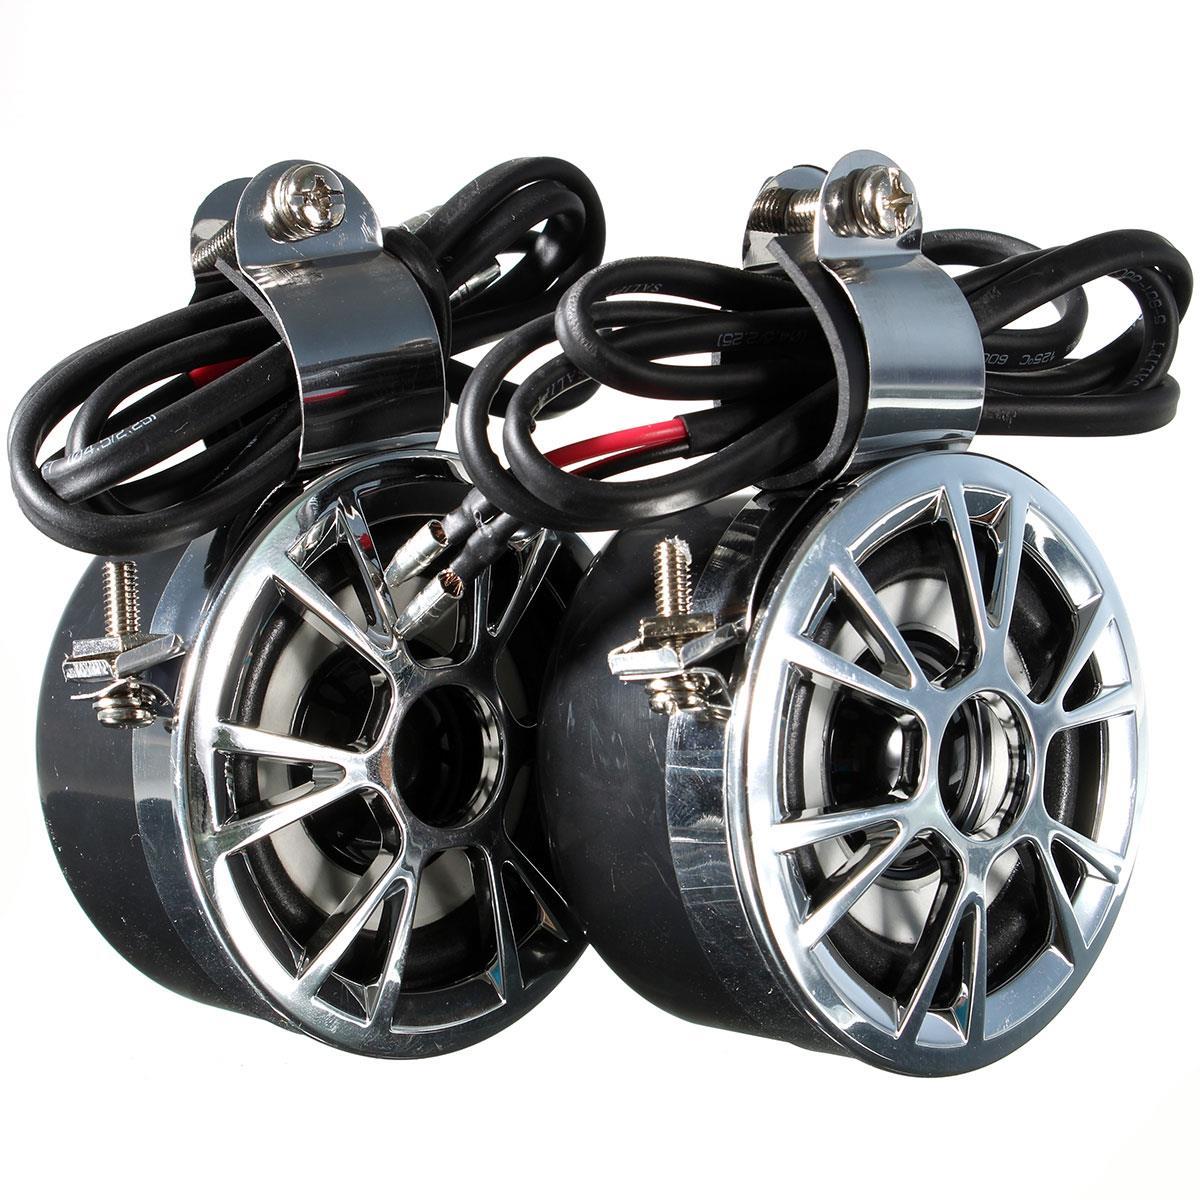 Super LOUD + WATERPROOF Universal Motorcycle Motorbike Handlebar Speaker Stereo Amplified Horn 12V 15-30W For Honda For Yamaha(China (Mainland))